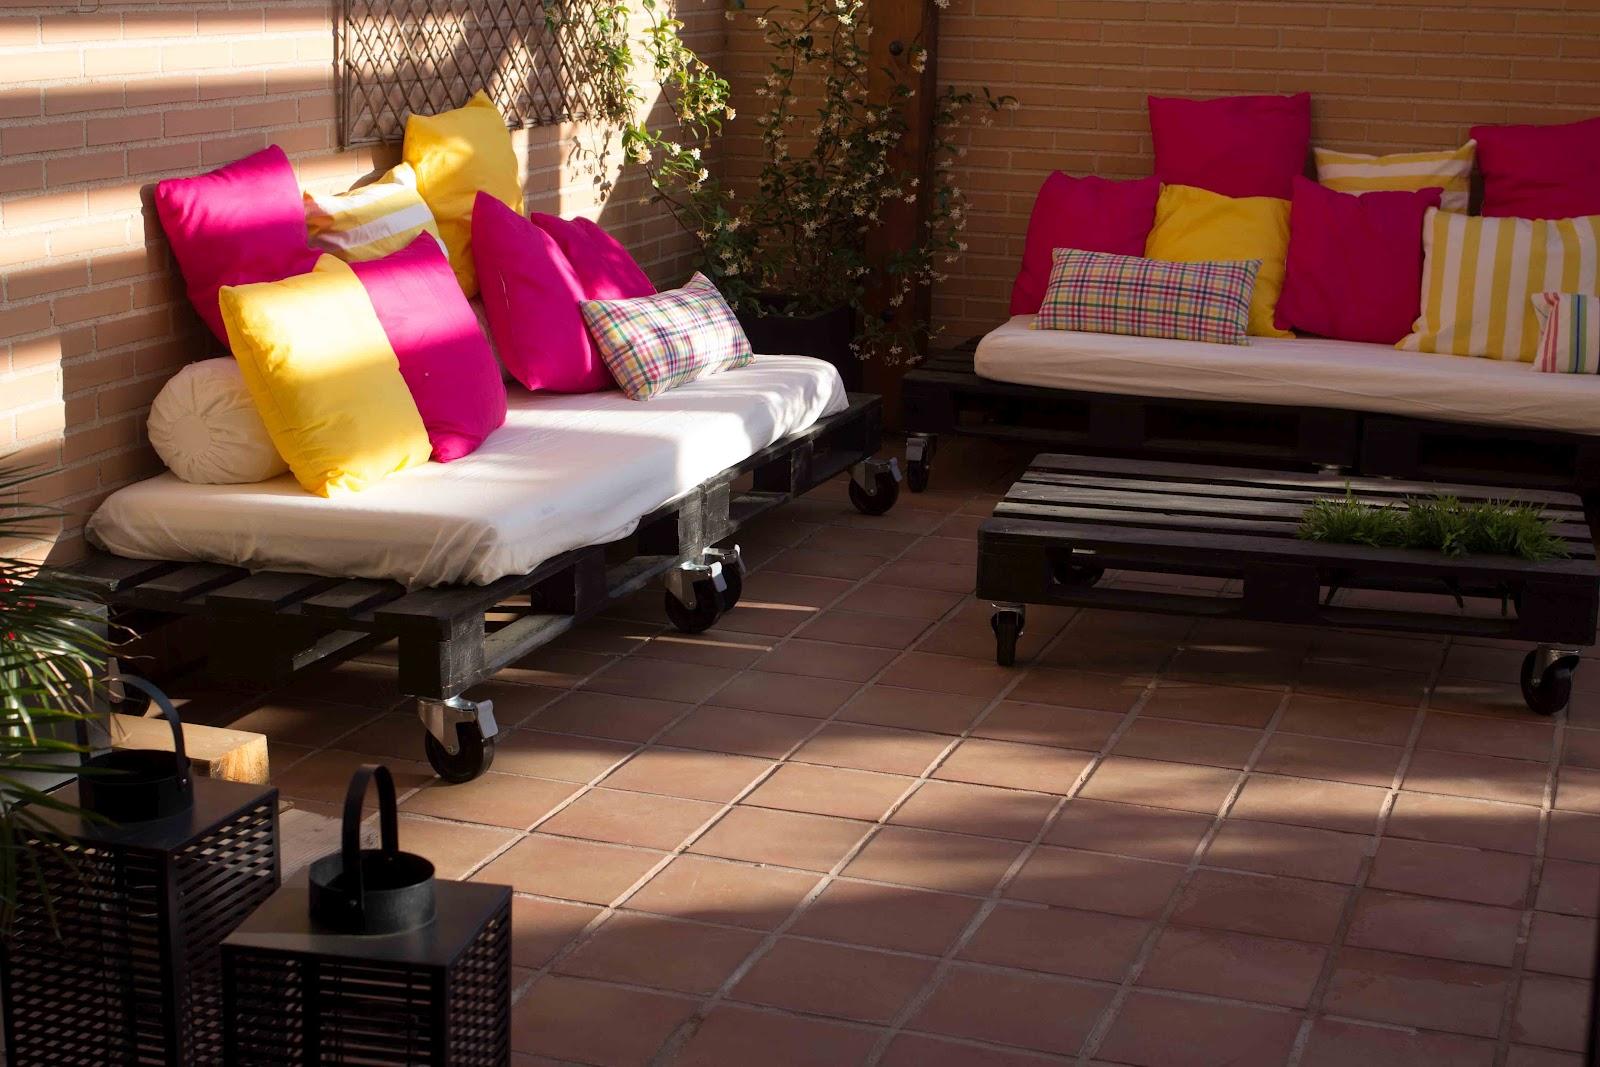 Sof de pal s para la terraza bricolaje for Colchoneta sofa exterior